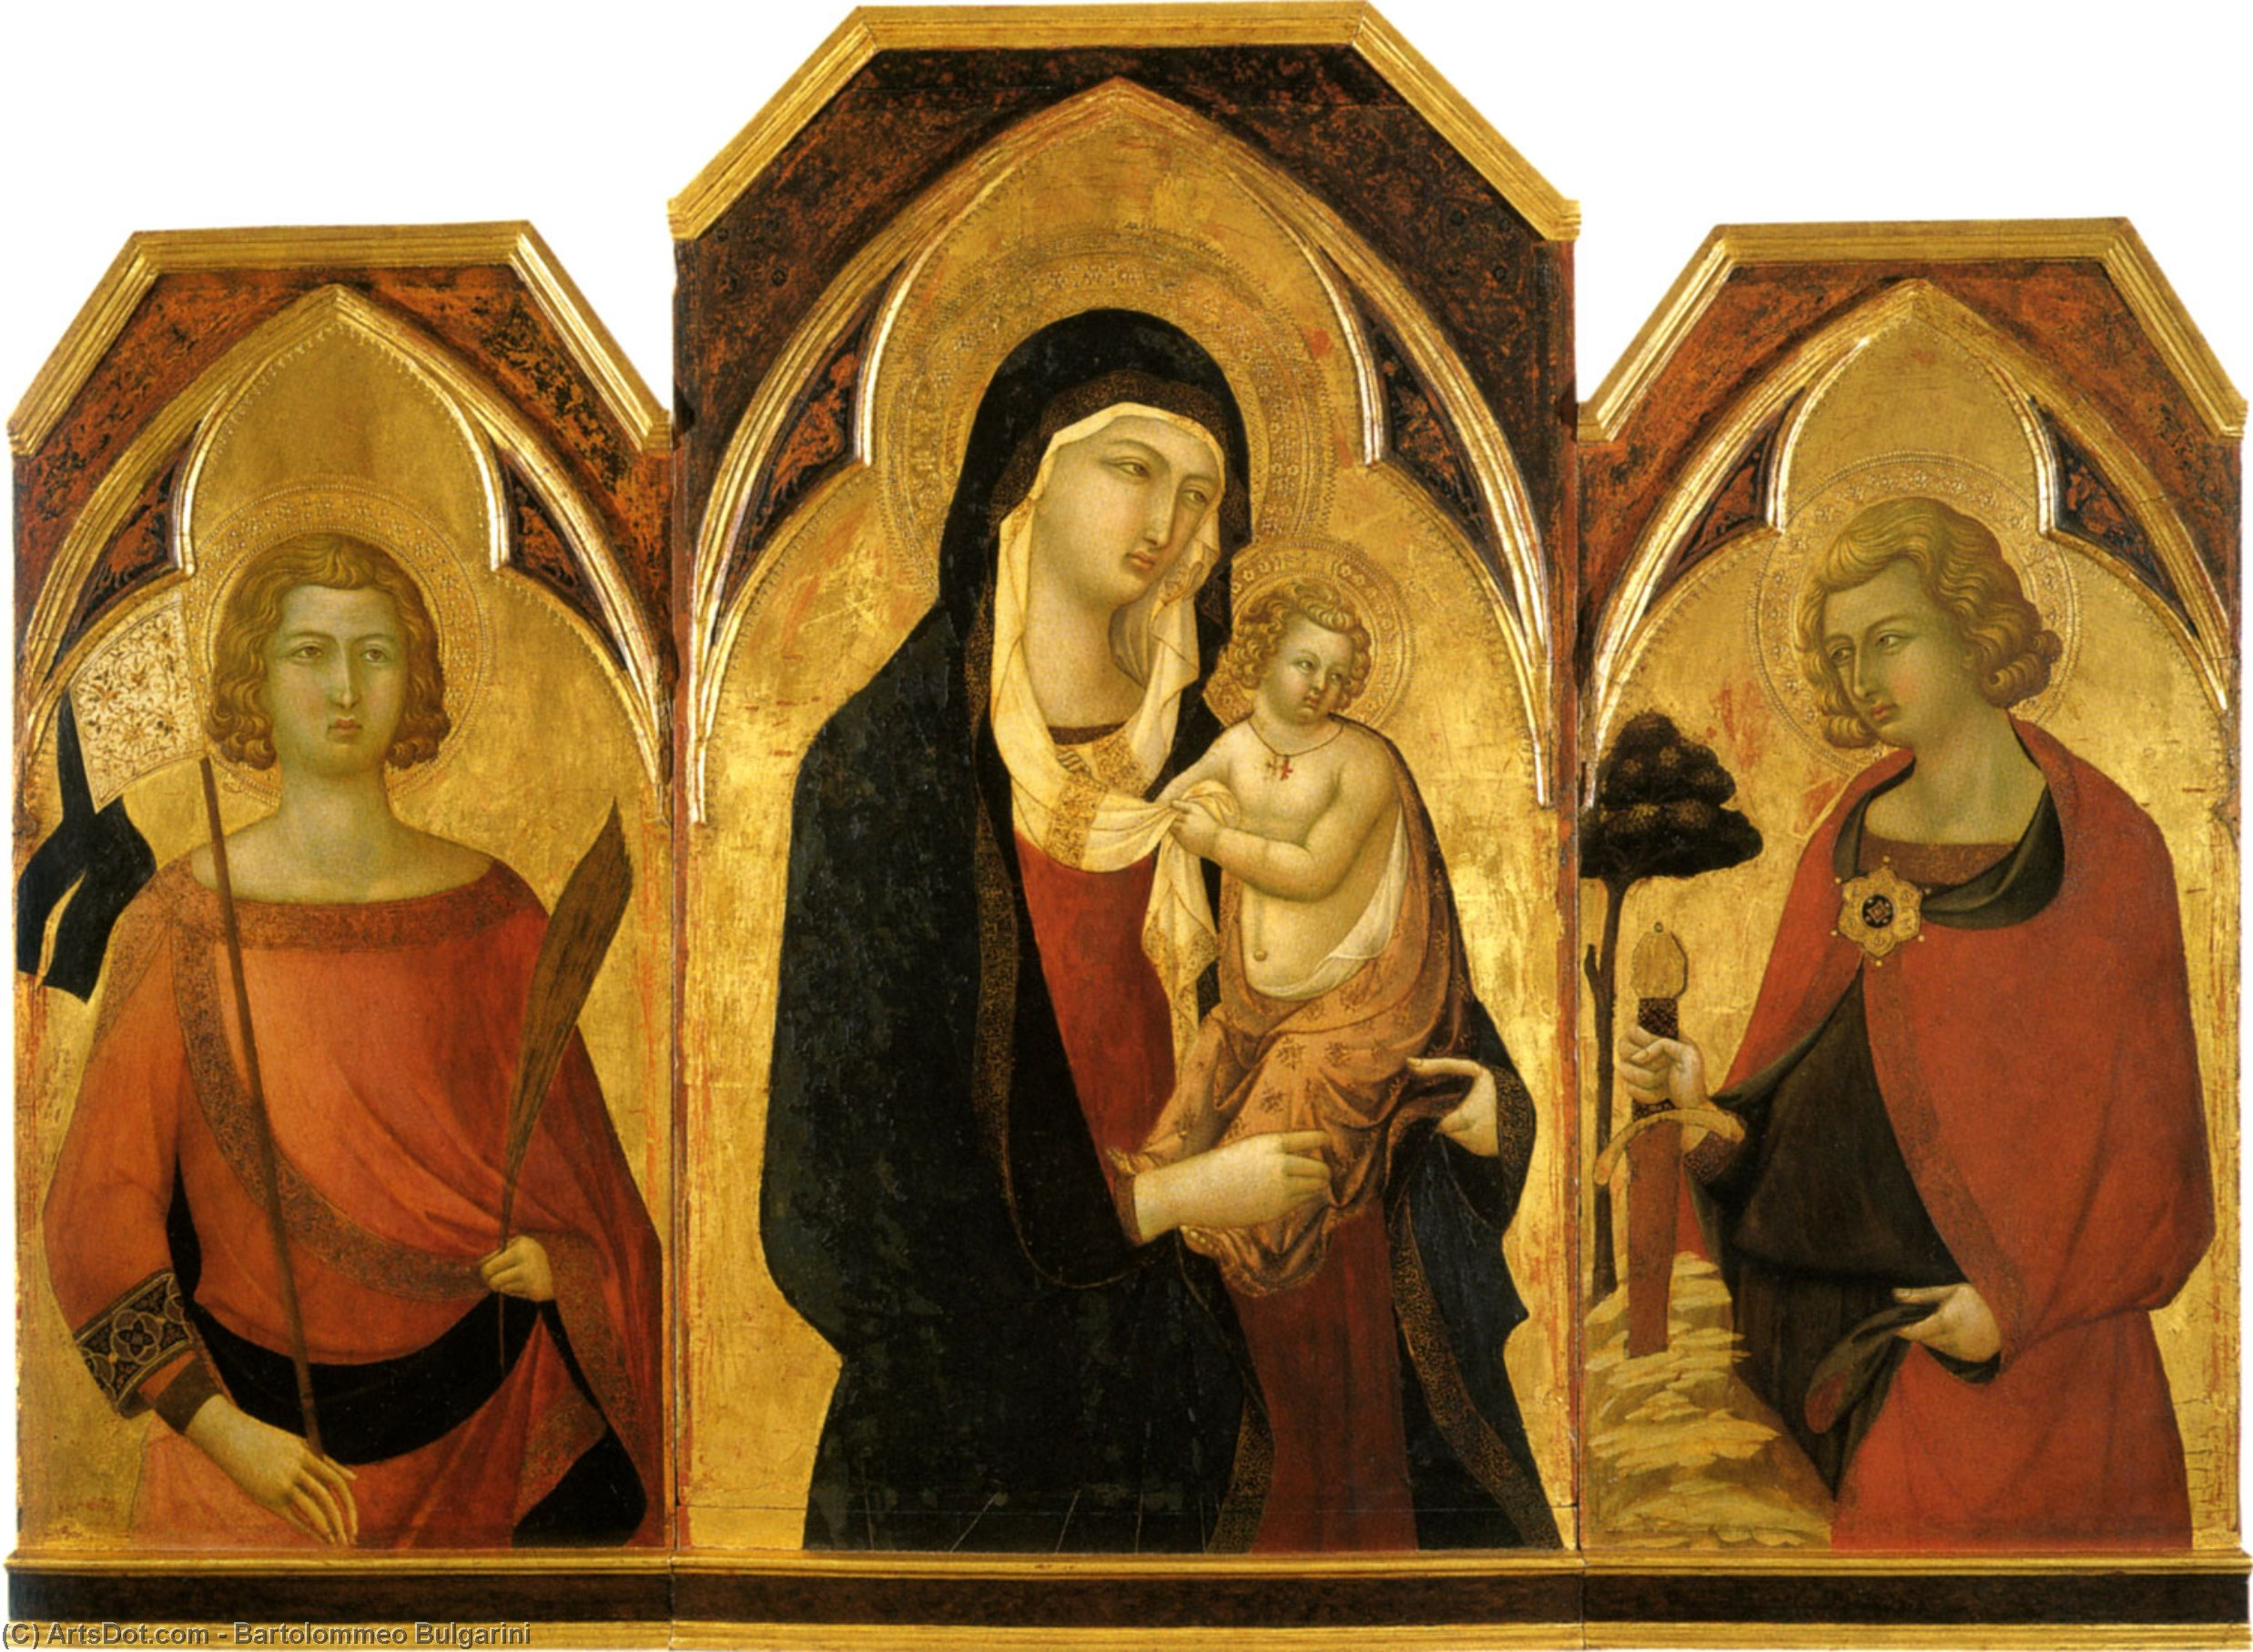 WikiOO.org - Enciklopedija dailės - Tapyba, meno kuriniai Bartolommeo Bulgarini - The madonna and child with saints